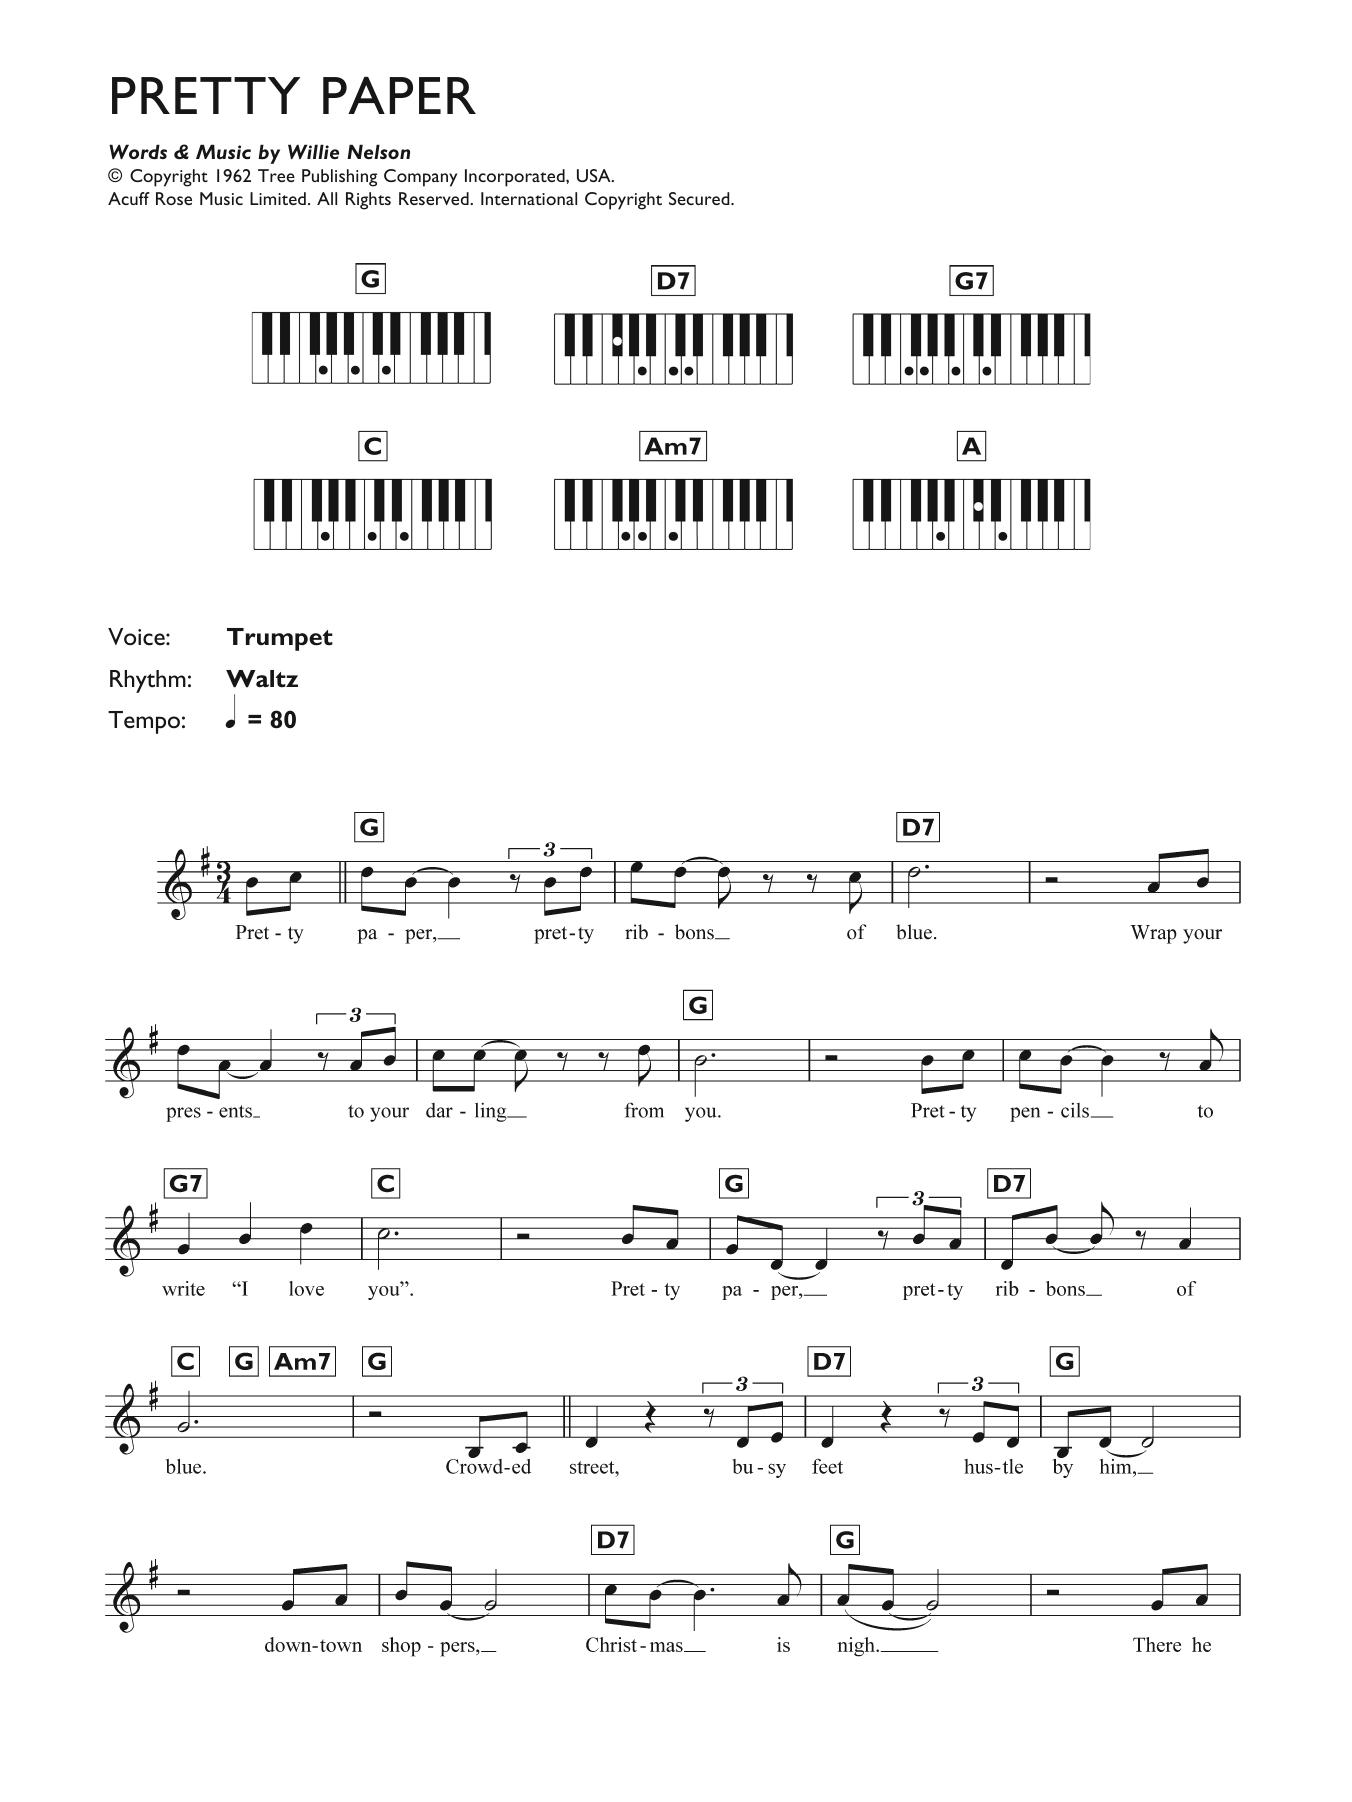 Sheet Music Digital Files To Print Licensed Willie Nelson Digital